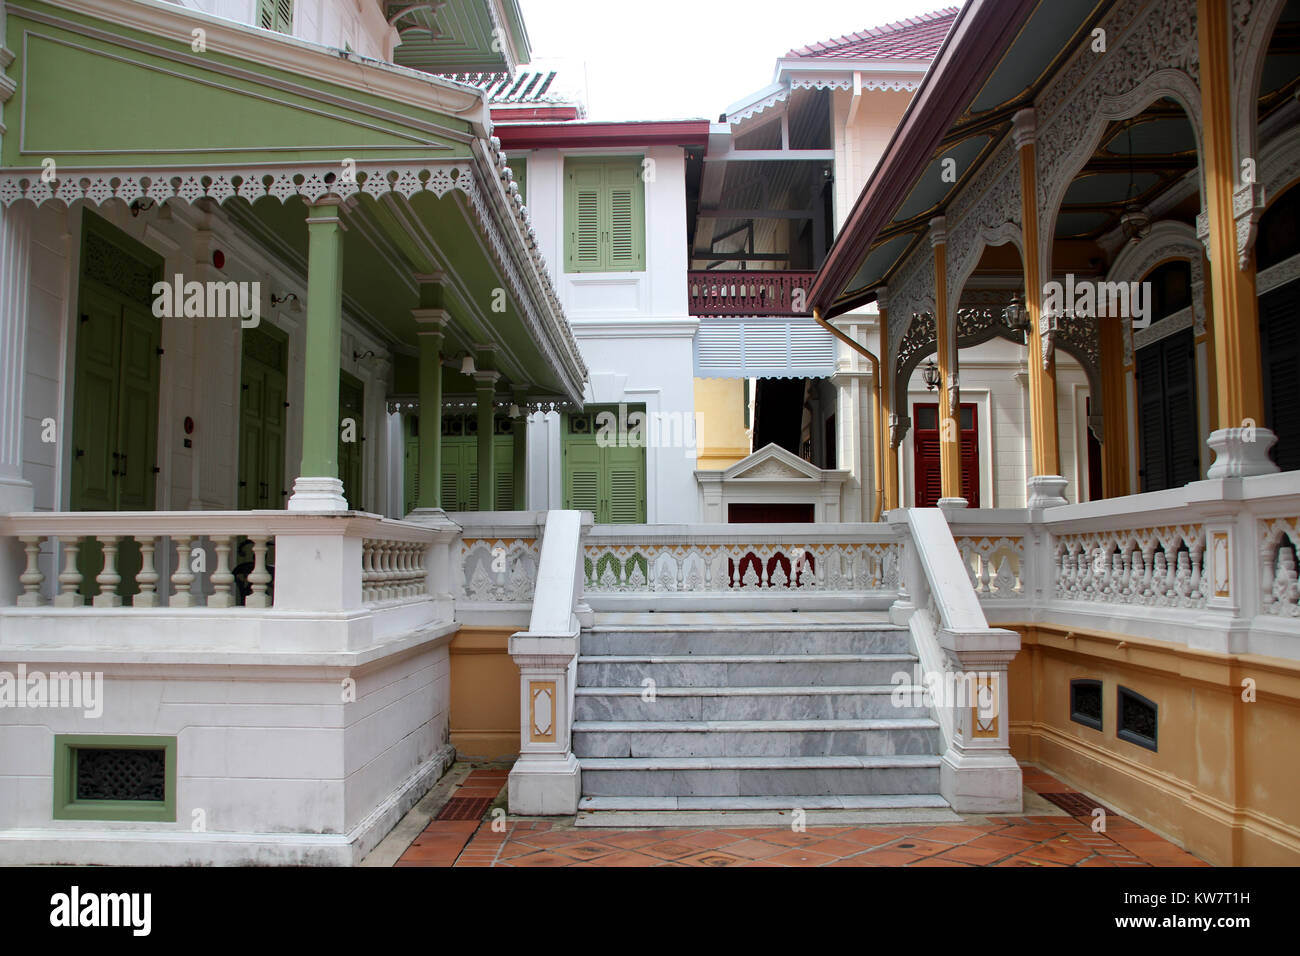 Europen style buildings in the Wat Bowonniwe, Bangkok, Thailand - Stock Image